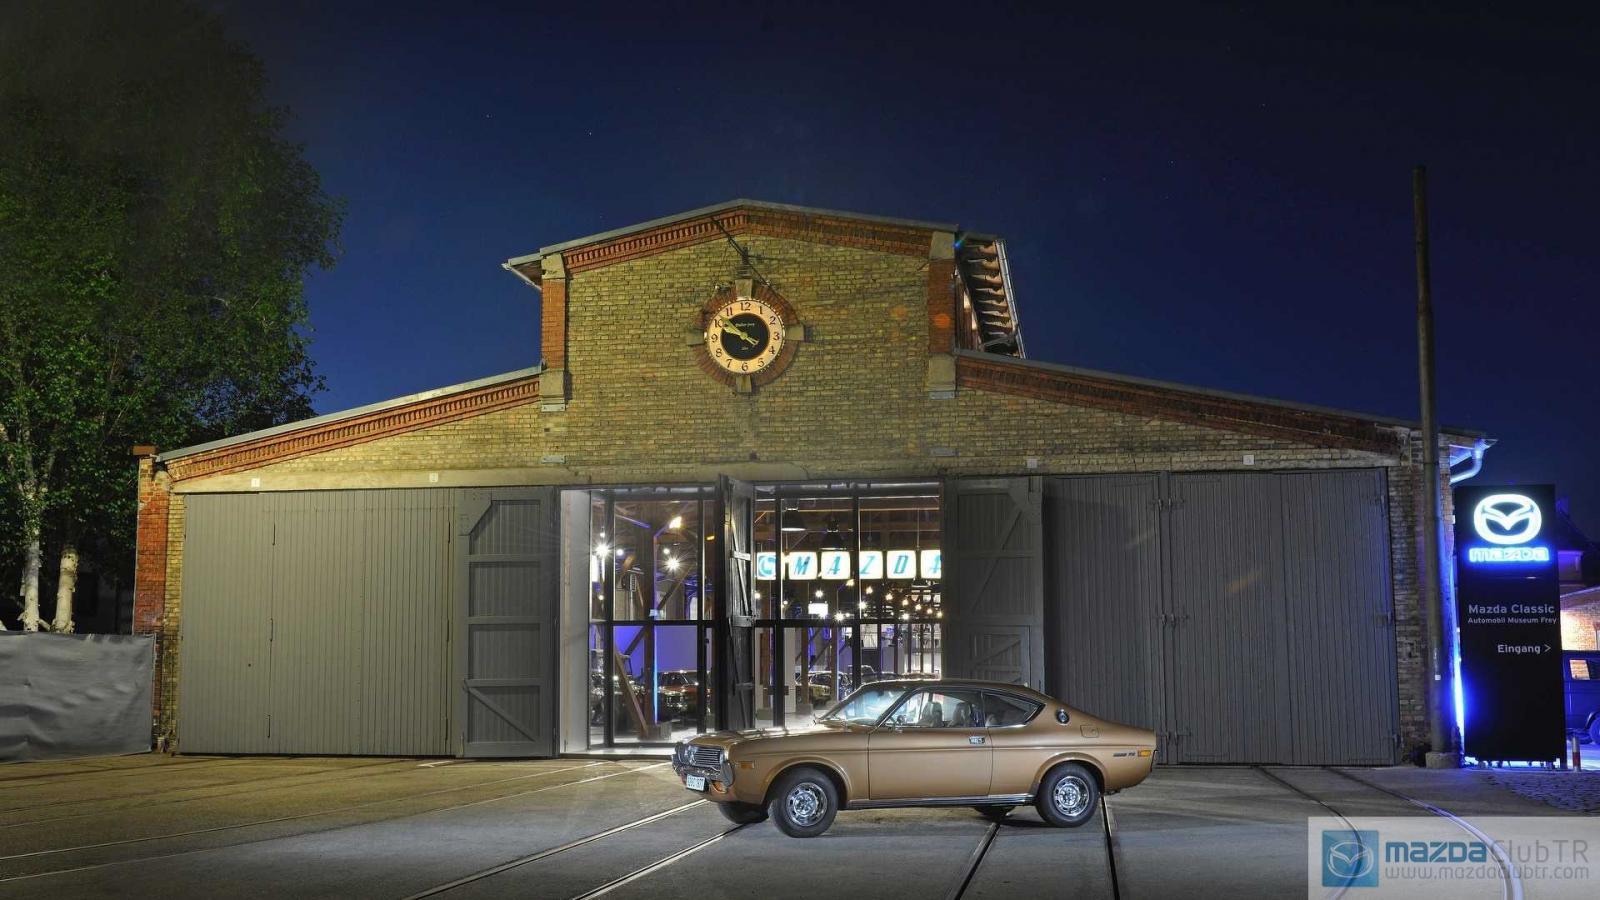 mazda-classic-car-museum (1).jpg